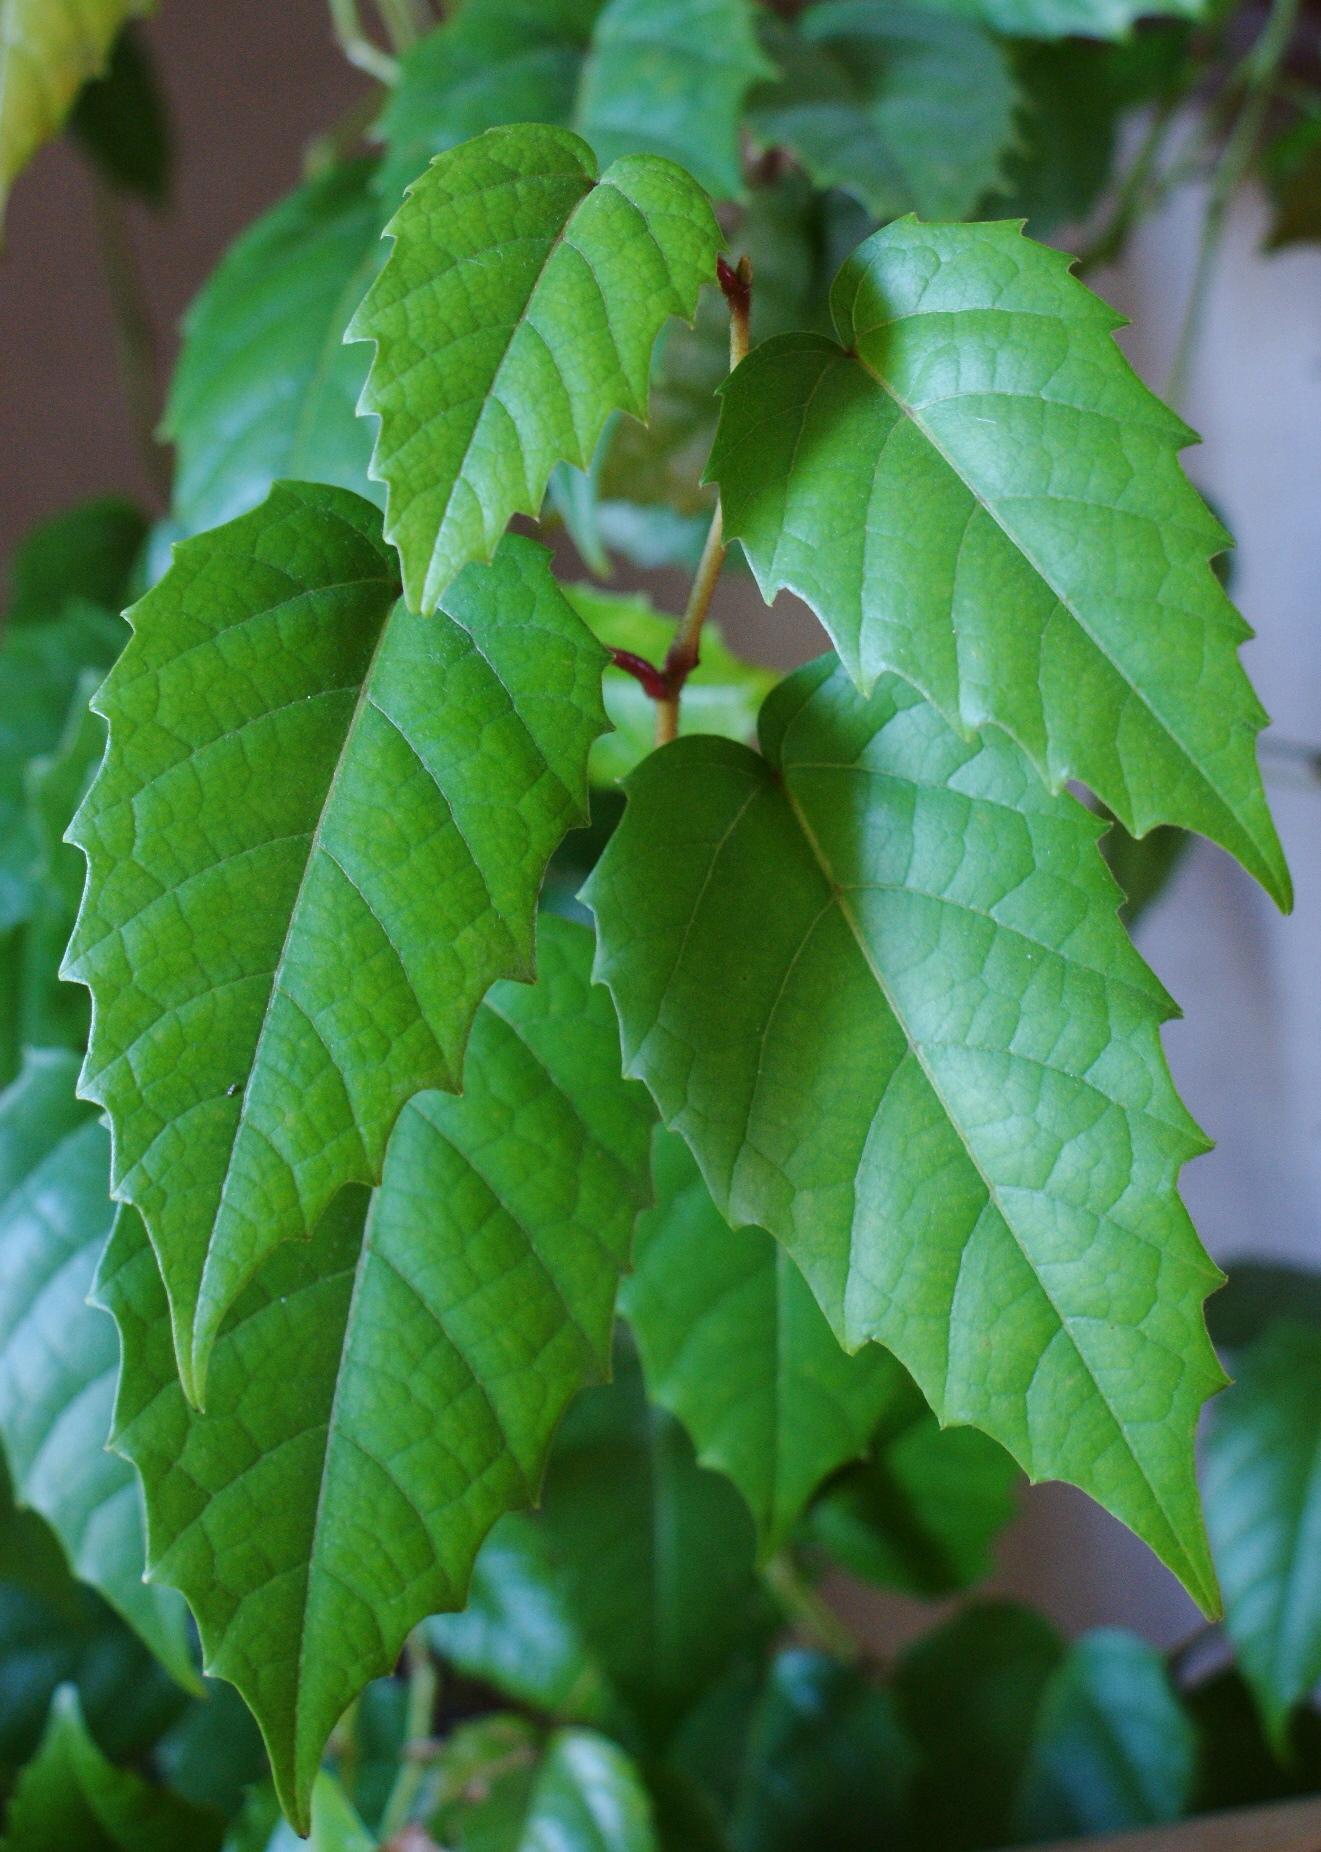 Cissus_antarctica_kz1 Cissus House Plant on kiwi fruit plant, codium plant, brassaia plant, rhapis plant, bursera plant, coccoloba plant, dioscorea plant, chirita plant, adromischus plant, calandrinia plant, cocculus plant, epipremnum plant, asystasia plant, medinilla plant, calendula officinalis plant, dorstenia plant, barleria plant, fiddle leaf plant, veltheimia plant,